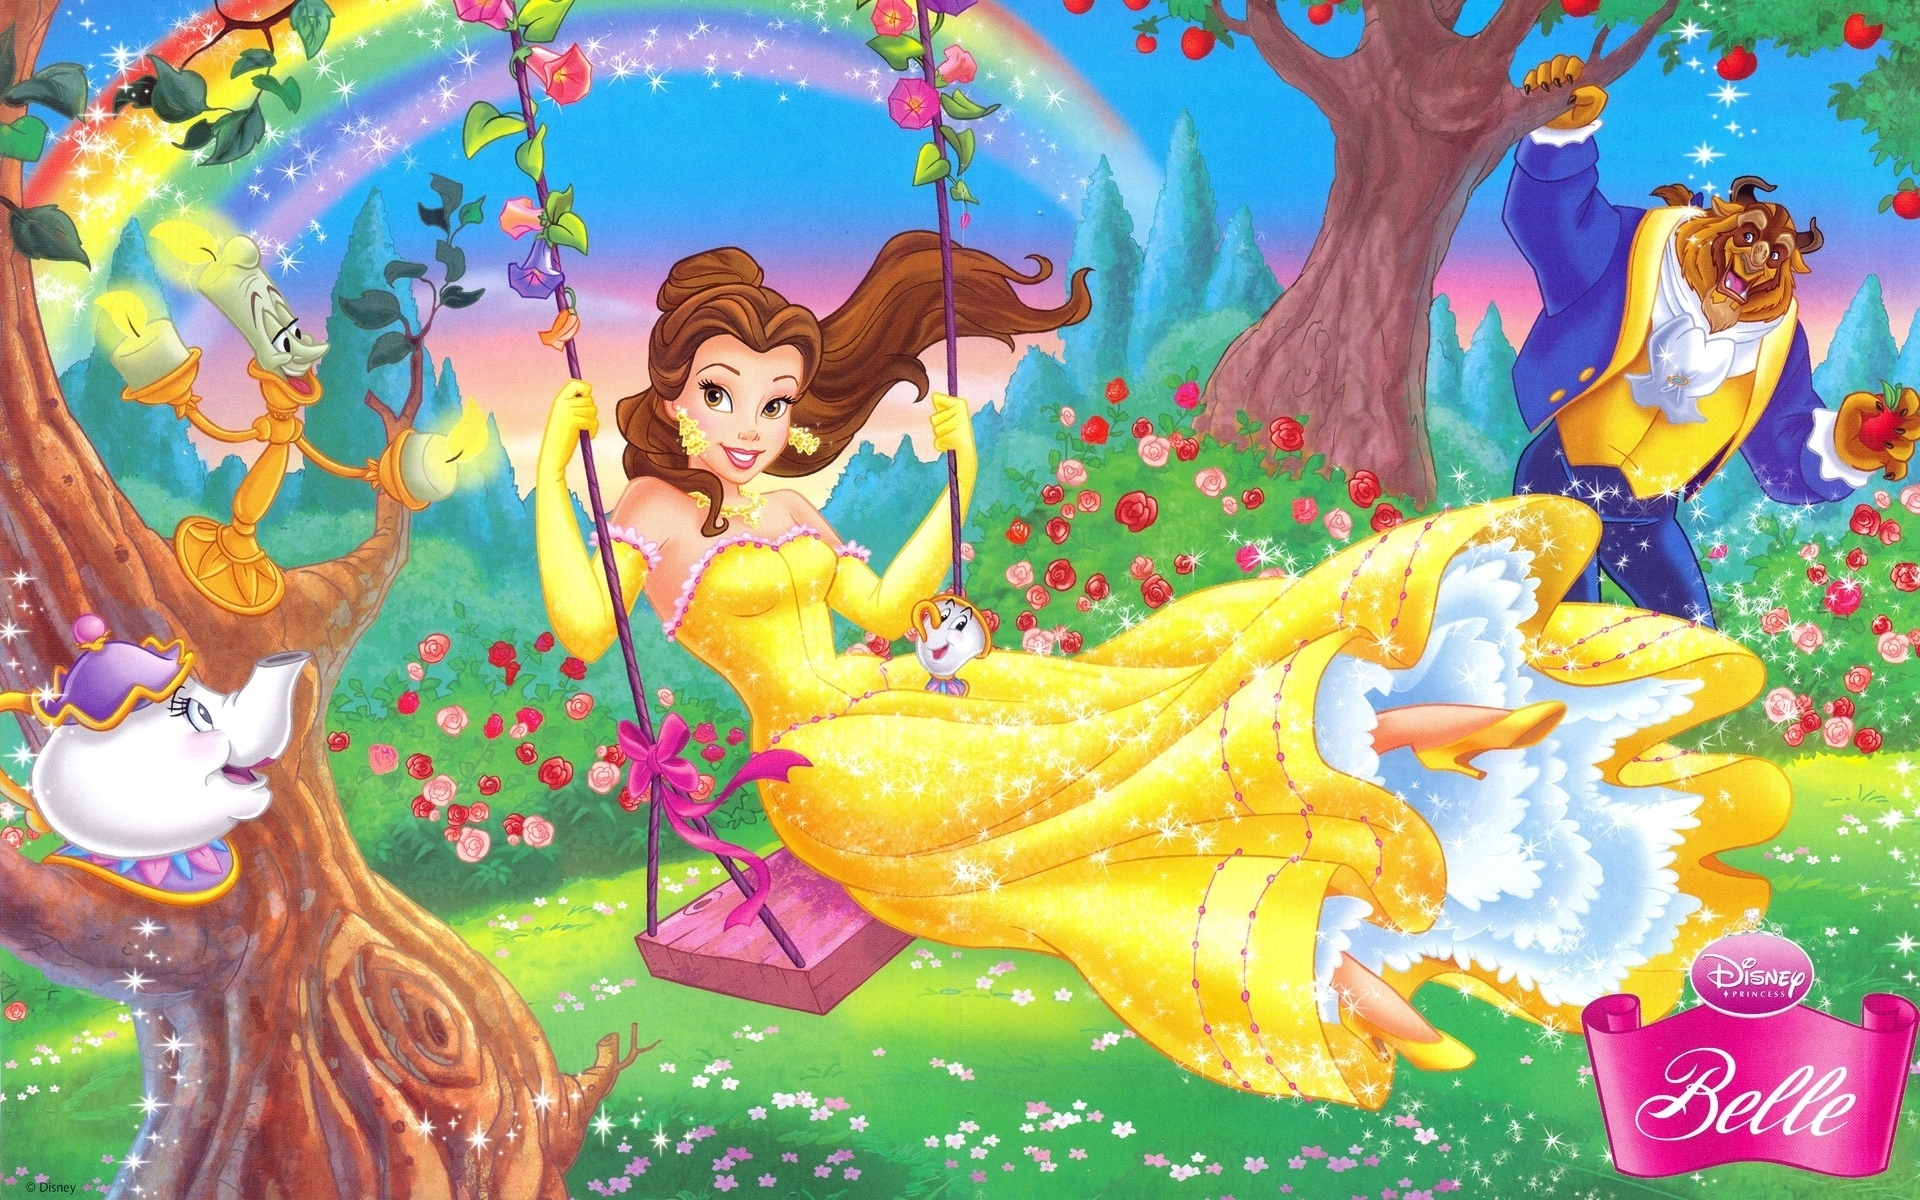 Disney Princess Belle Hd Wallpaper Free Download